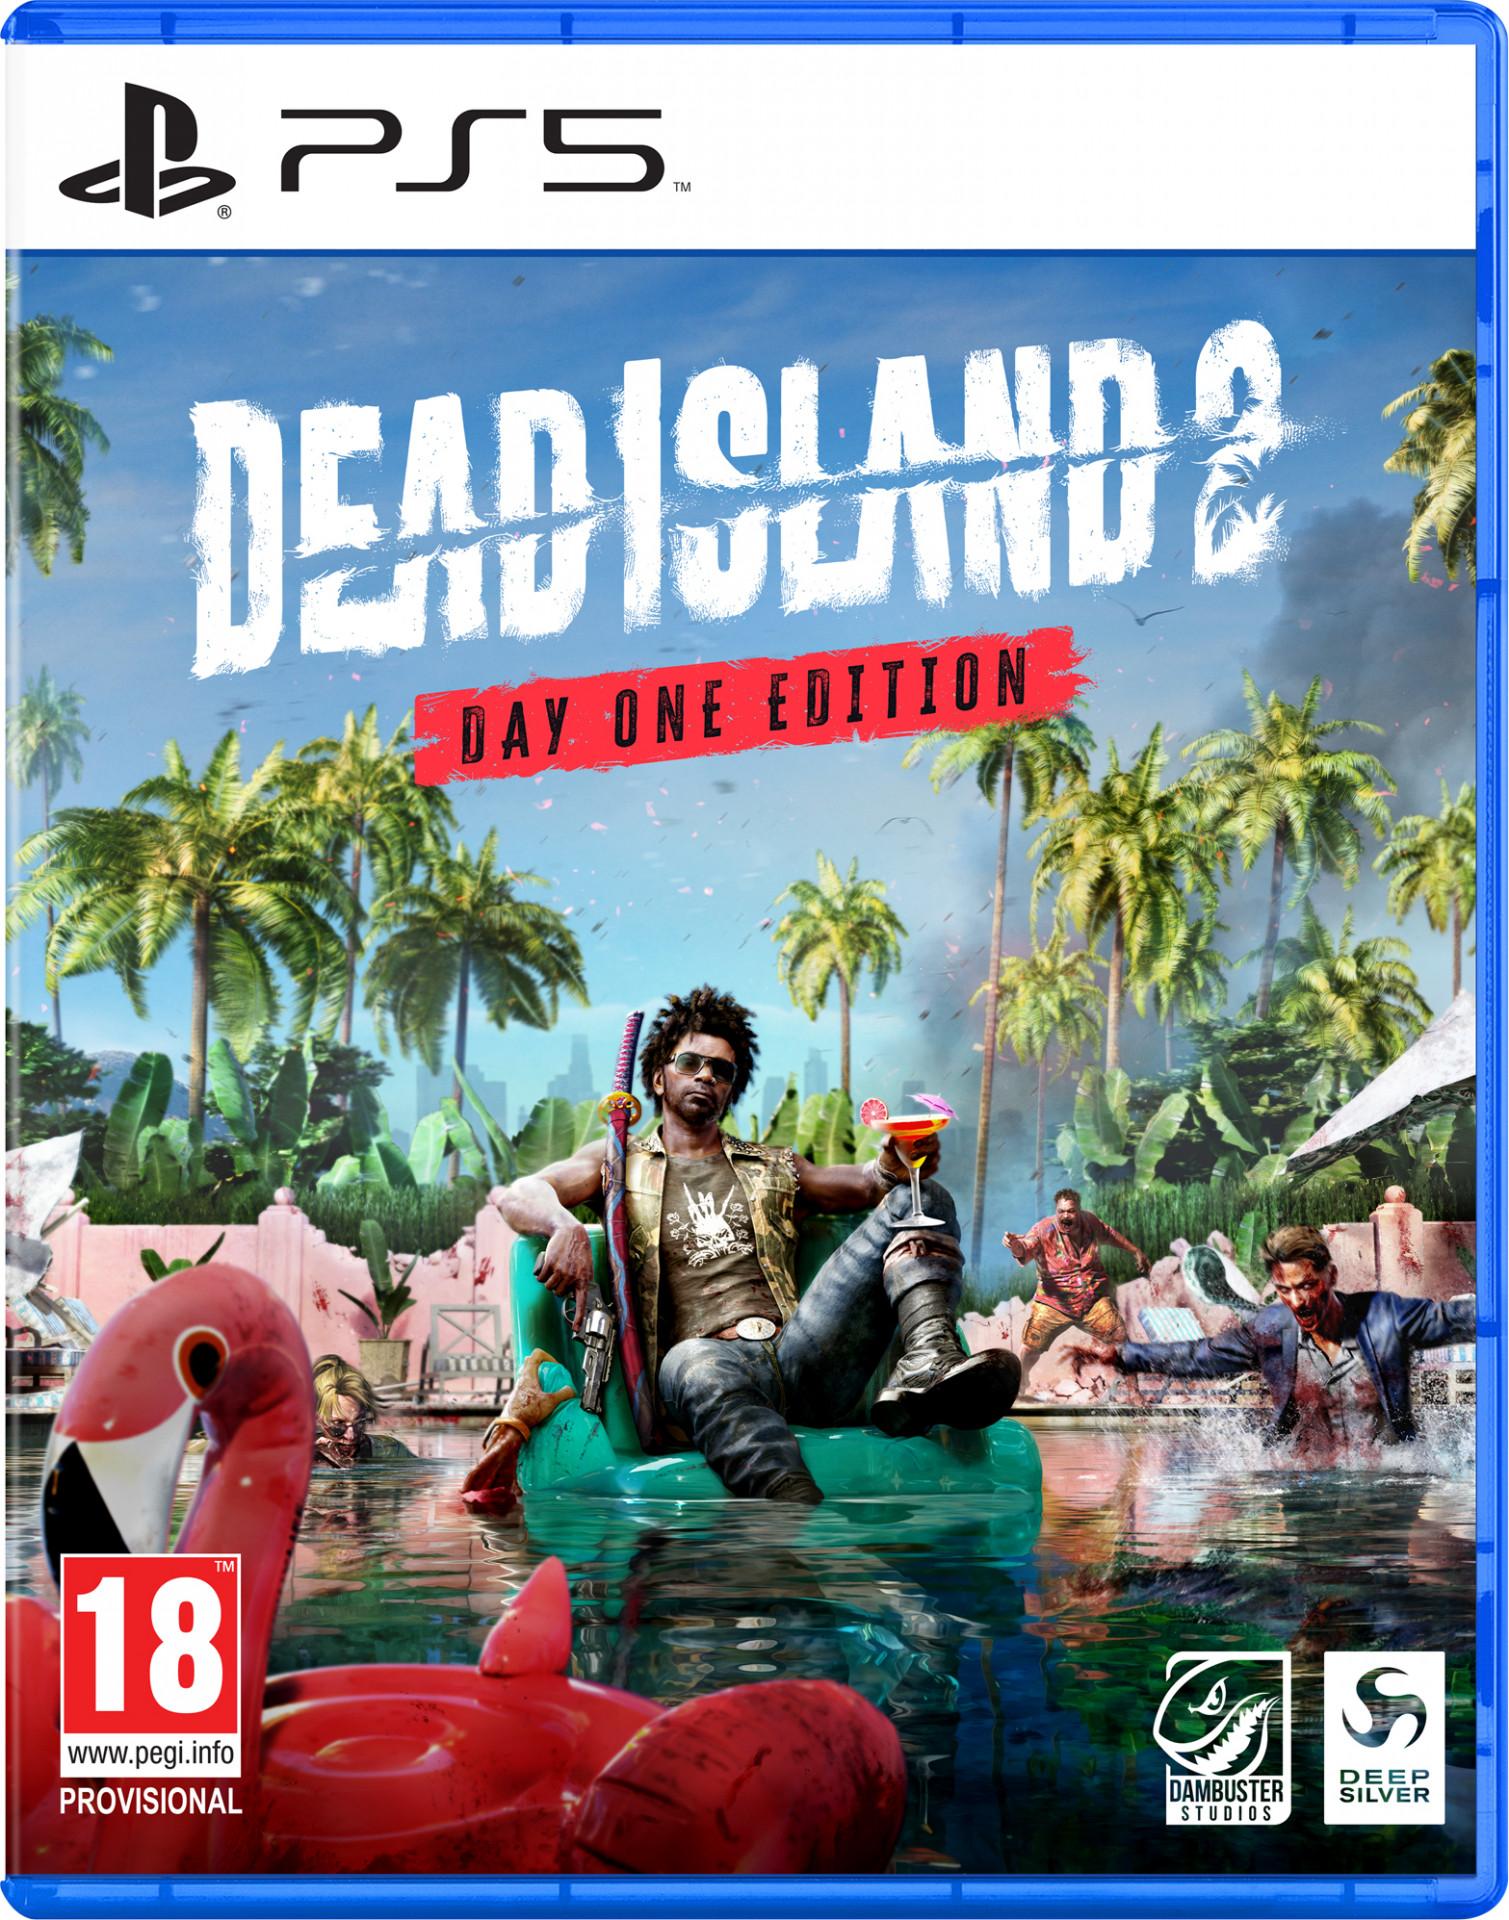 Dead Island 2, PC